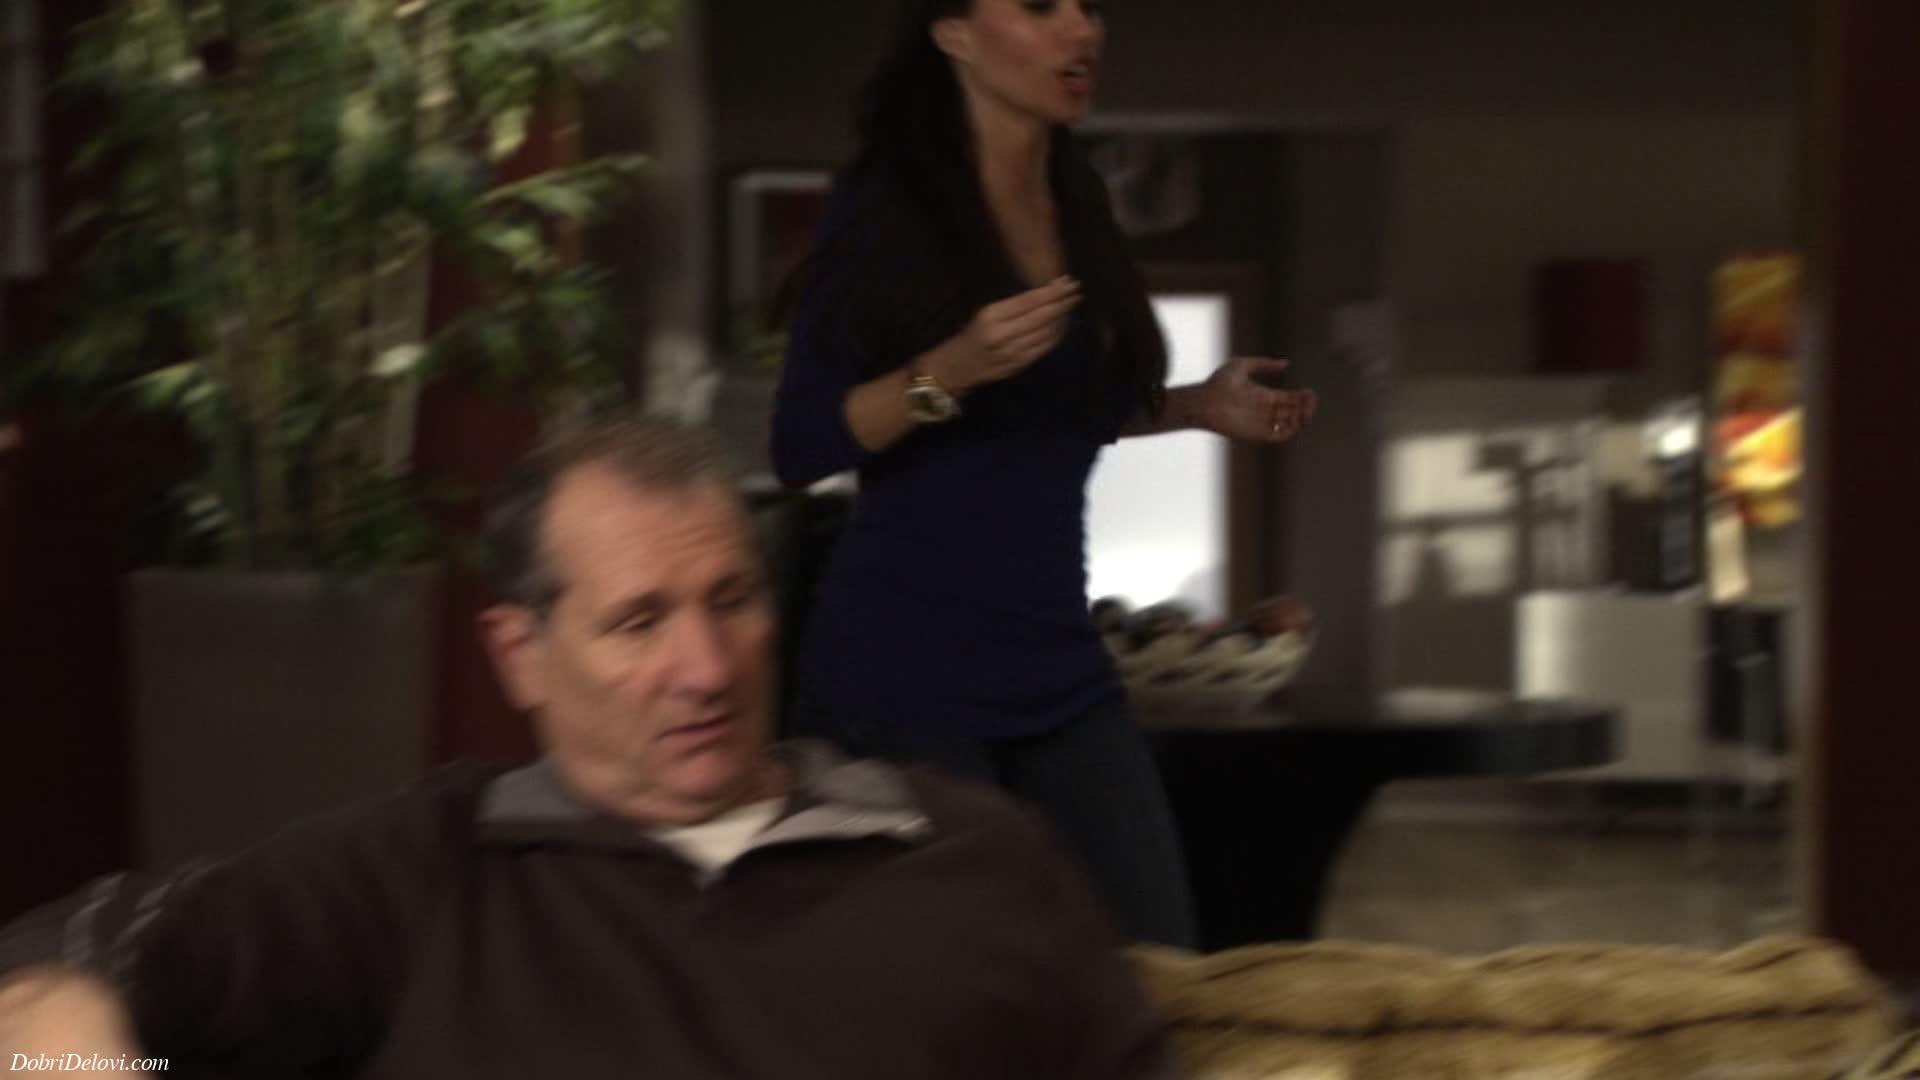 Sofia Vergara bouncing boobs scene from Modern Family